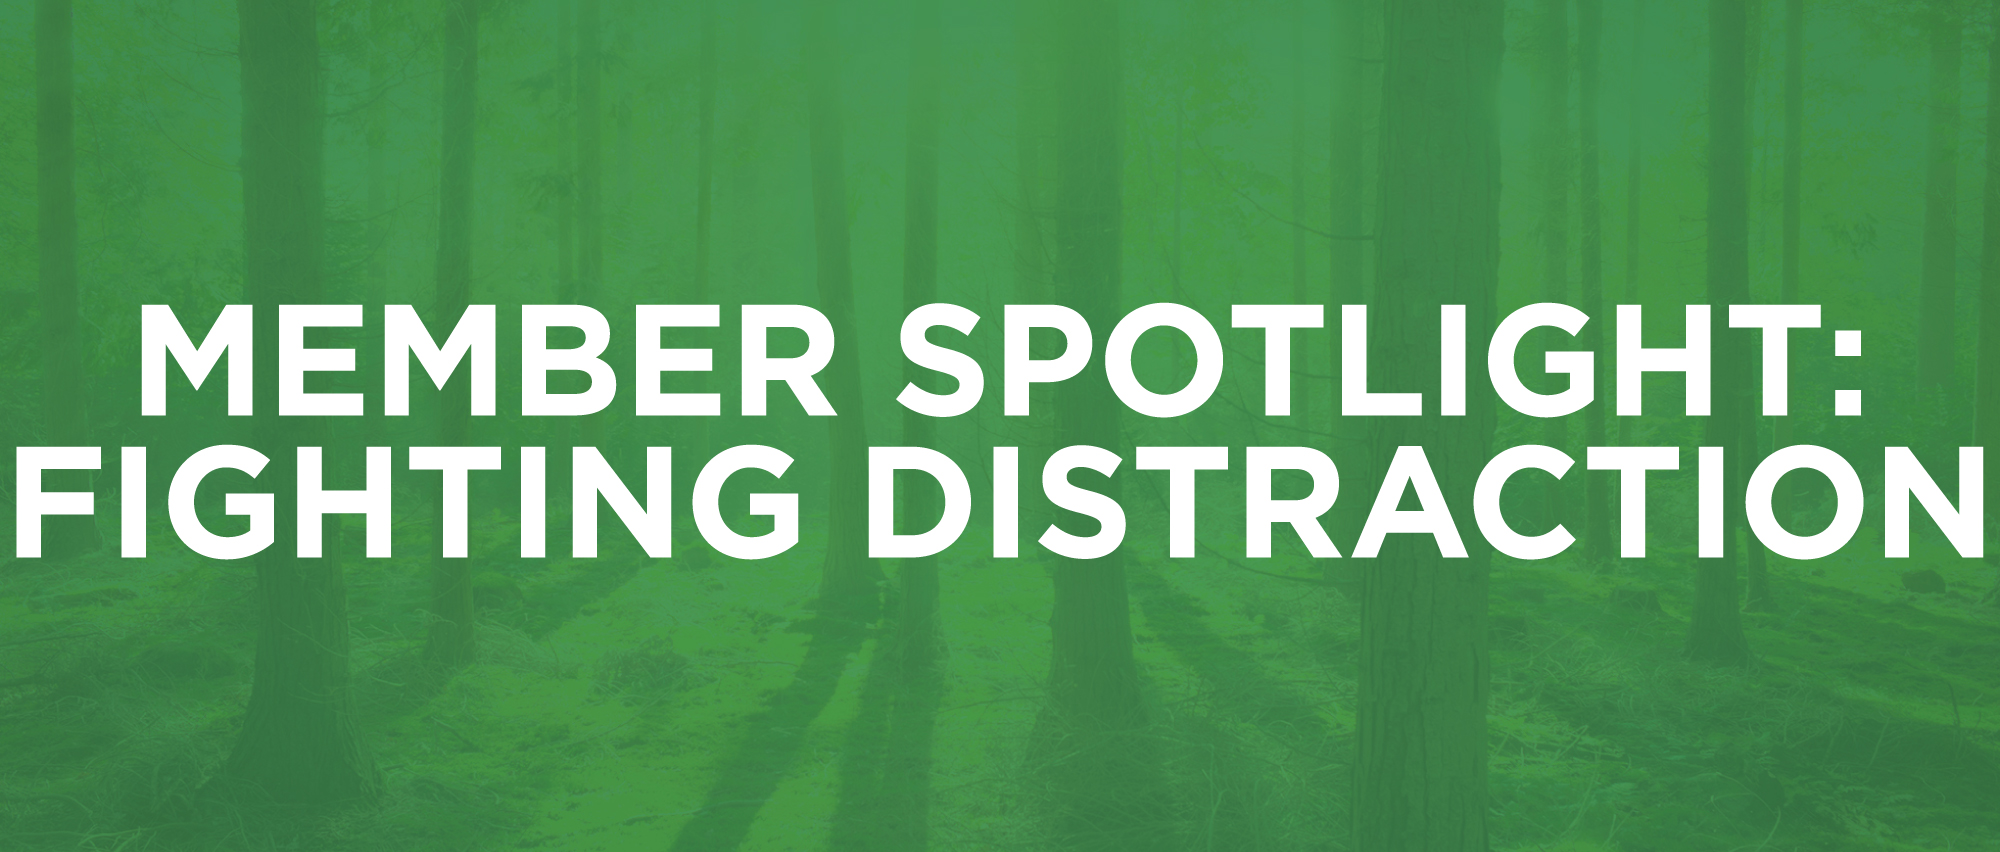 MemberSpotlight-2-Distraction.jpg